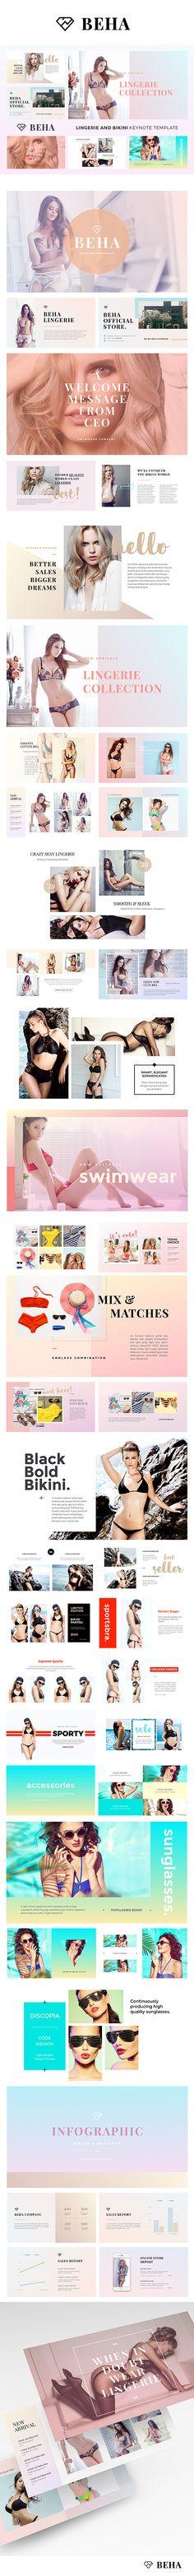 BEHA Lingerie And Bikini Keynote Template. Download here: https://graphicriver.net/item/beha-lingerie-and-bikini-keynote-template/17568137?ref=ksioks